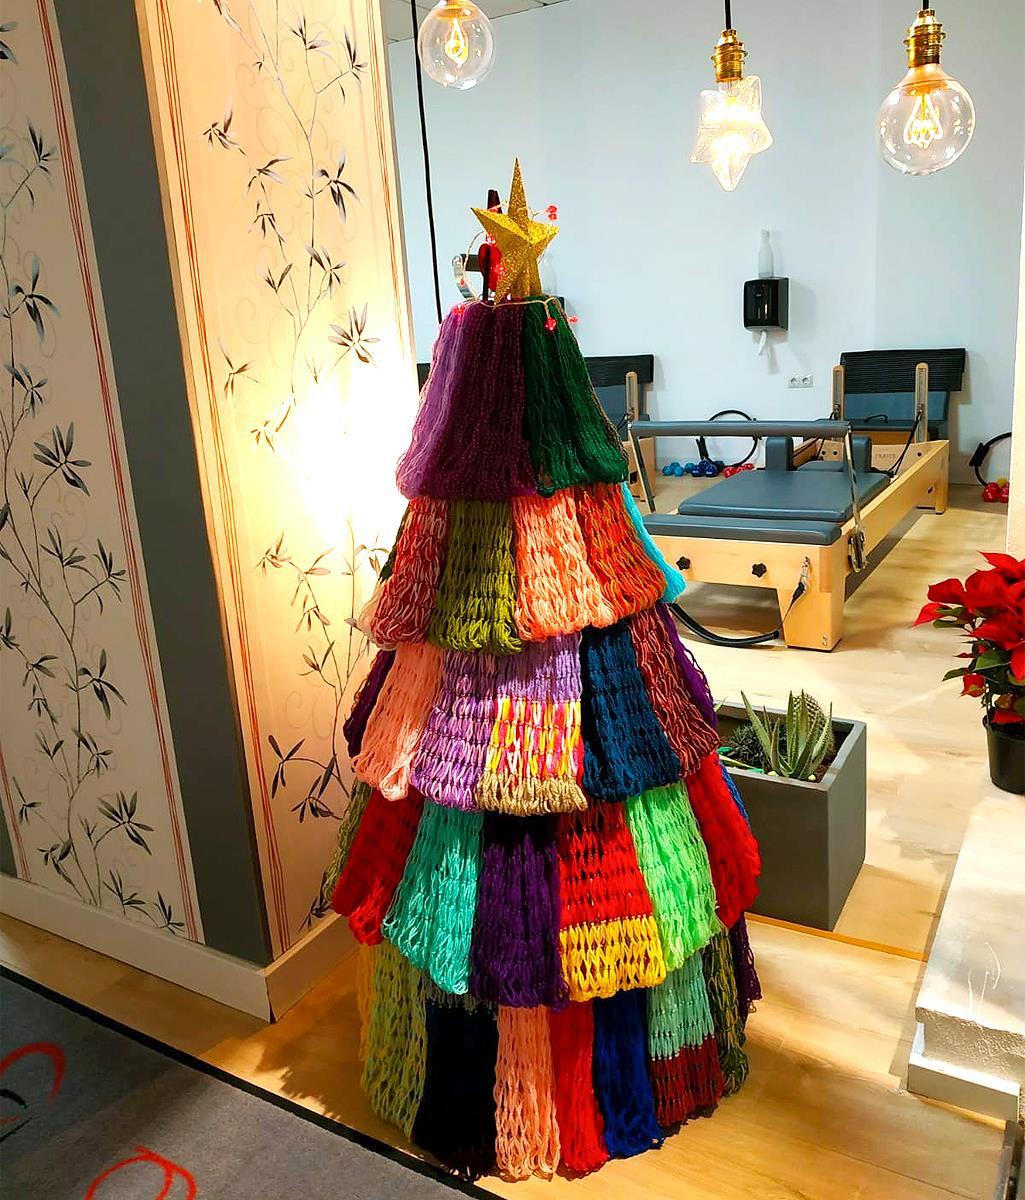 Handmade Scarves for Charity!